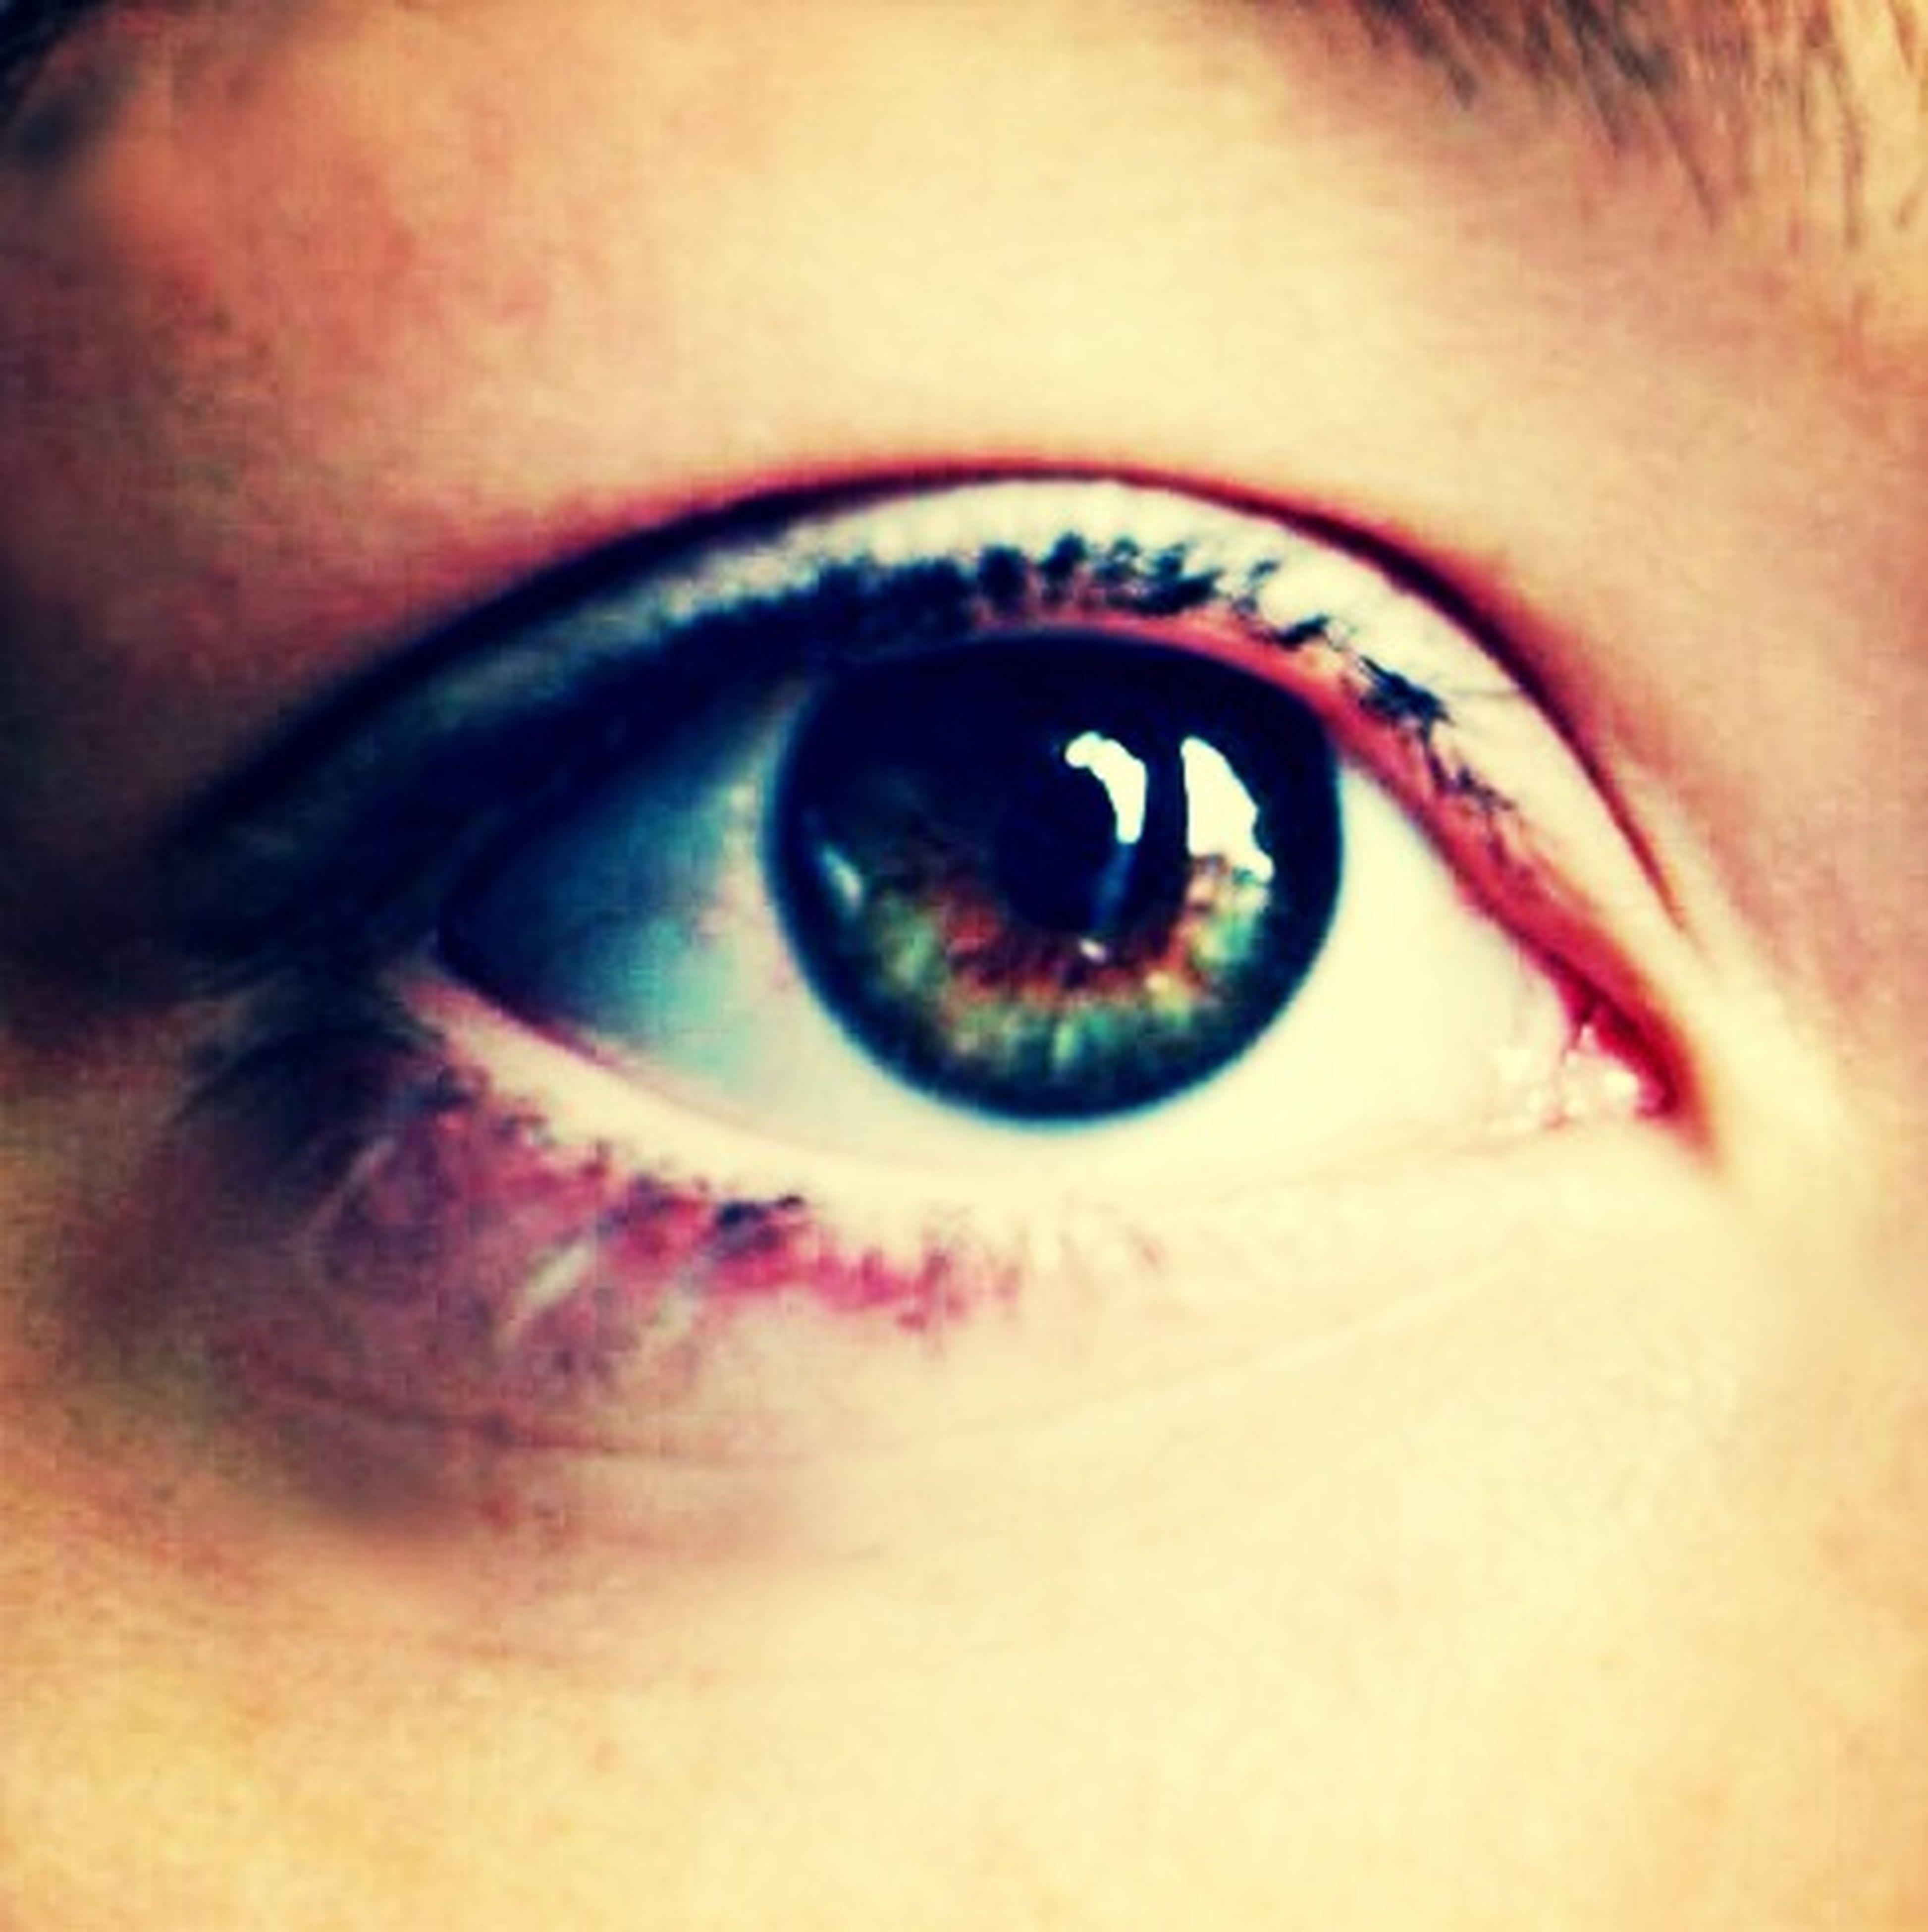 human eye, close-up, eyelash, eyesight, looking at camera, part of, portrait, lifestyles, iris - eye, sensory perception, human face, extreme close-up, eyeball, headshot, indoors, extreme close up, human skin